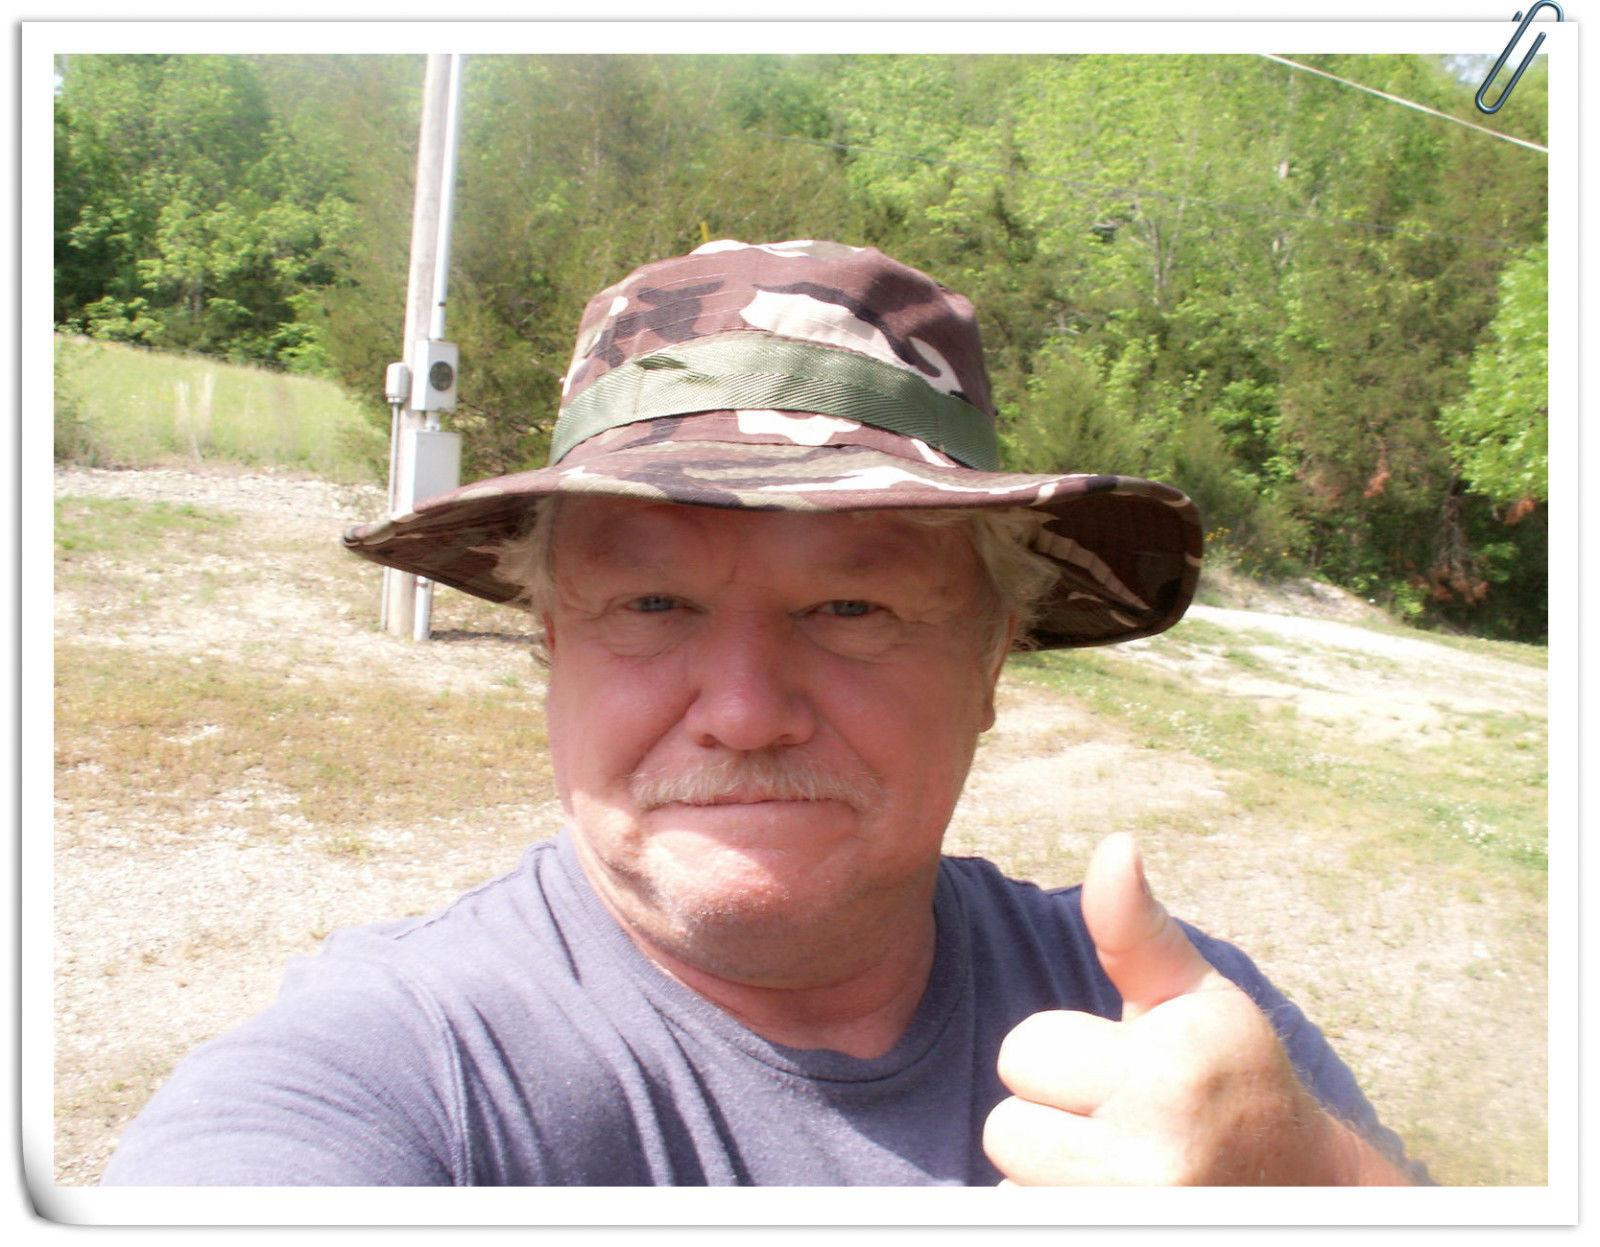 Golf Camoflauge Hunting Hiking Hat Mens Hats